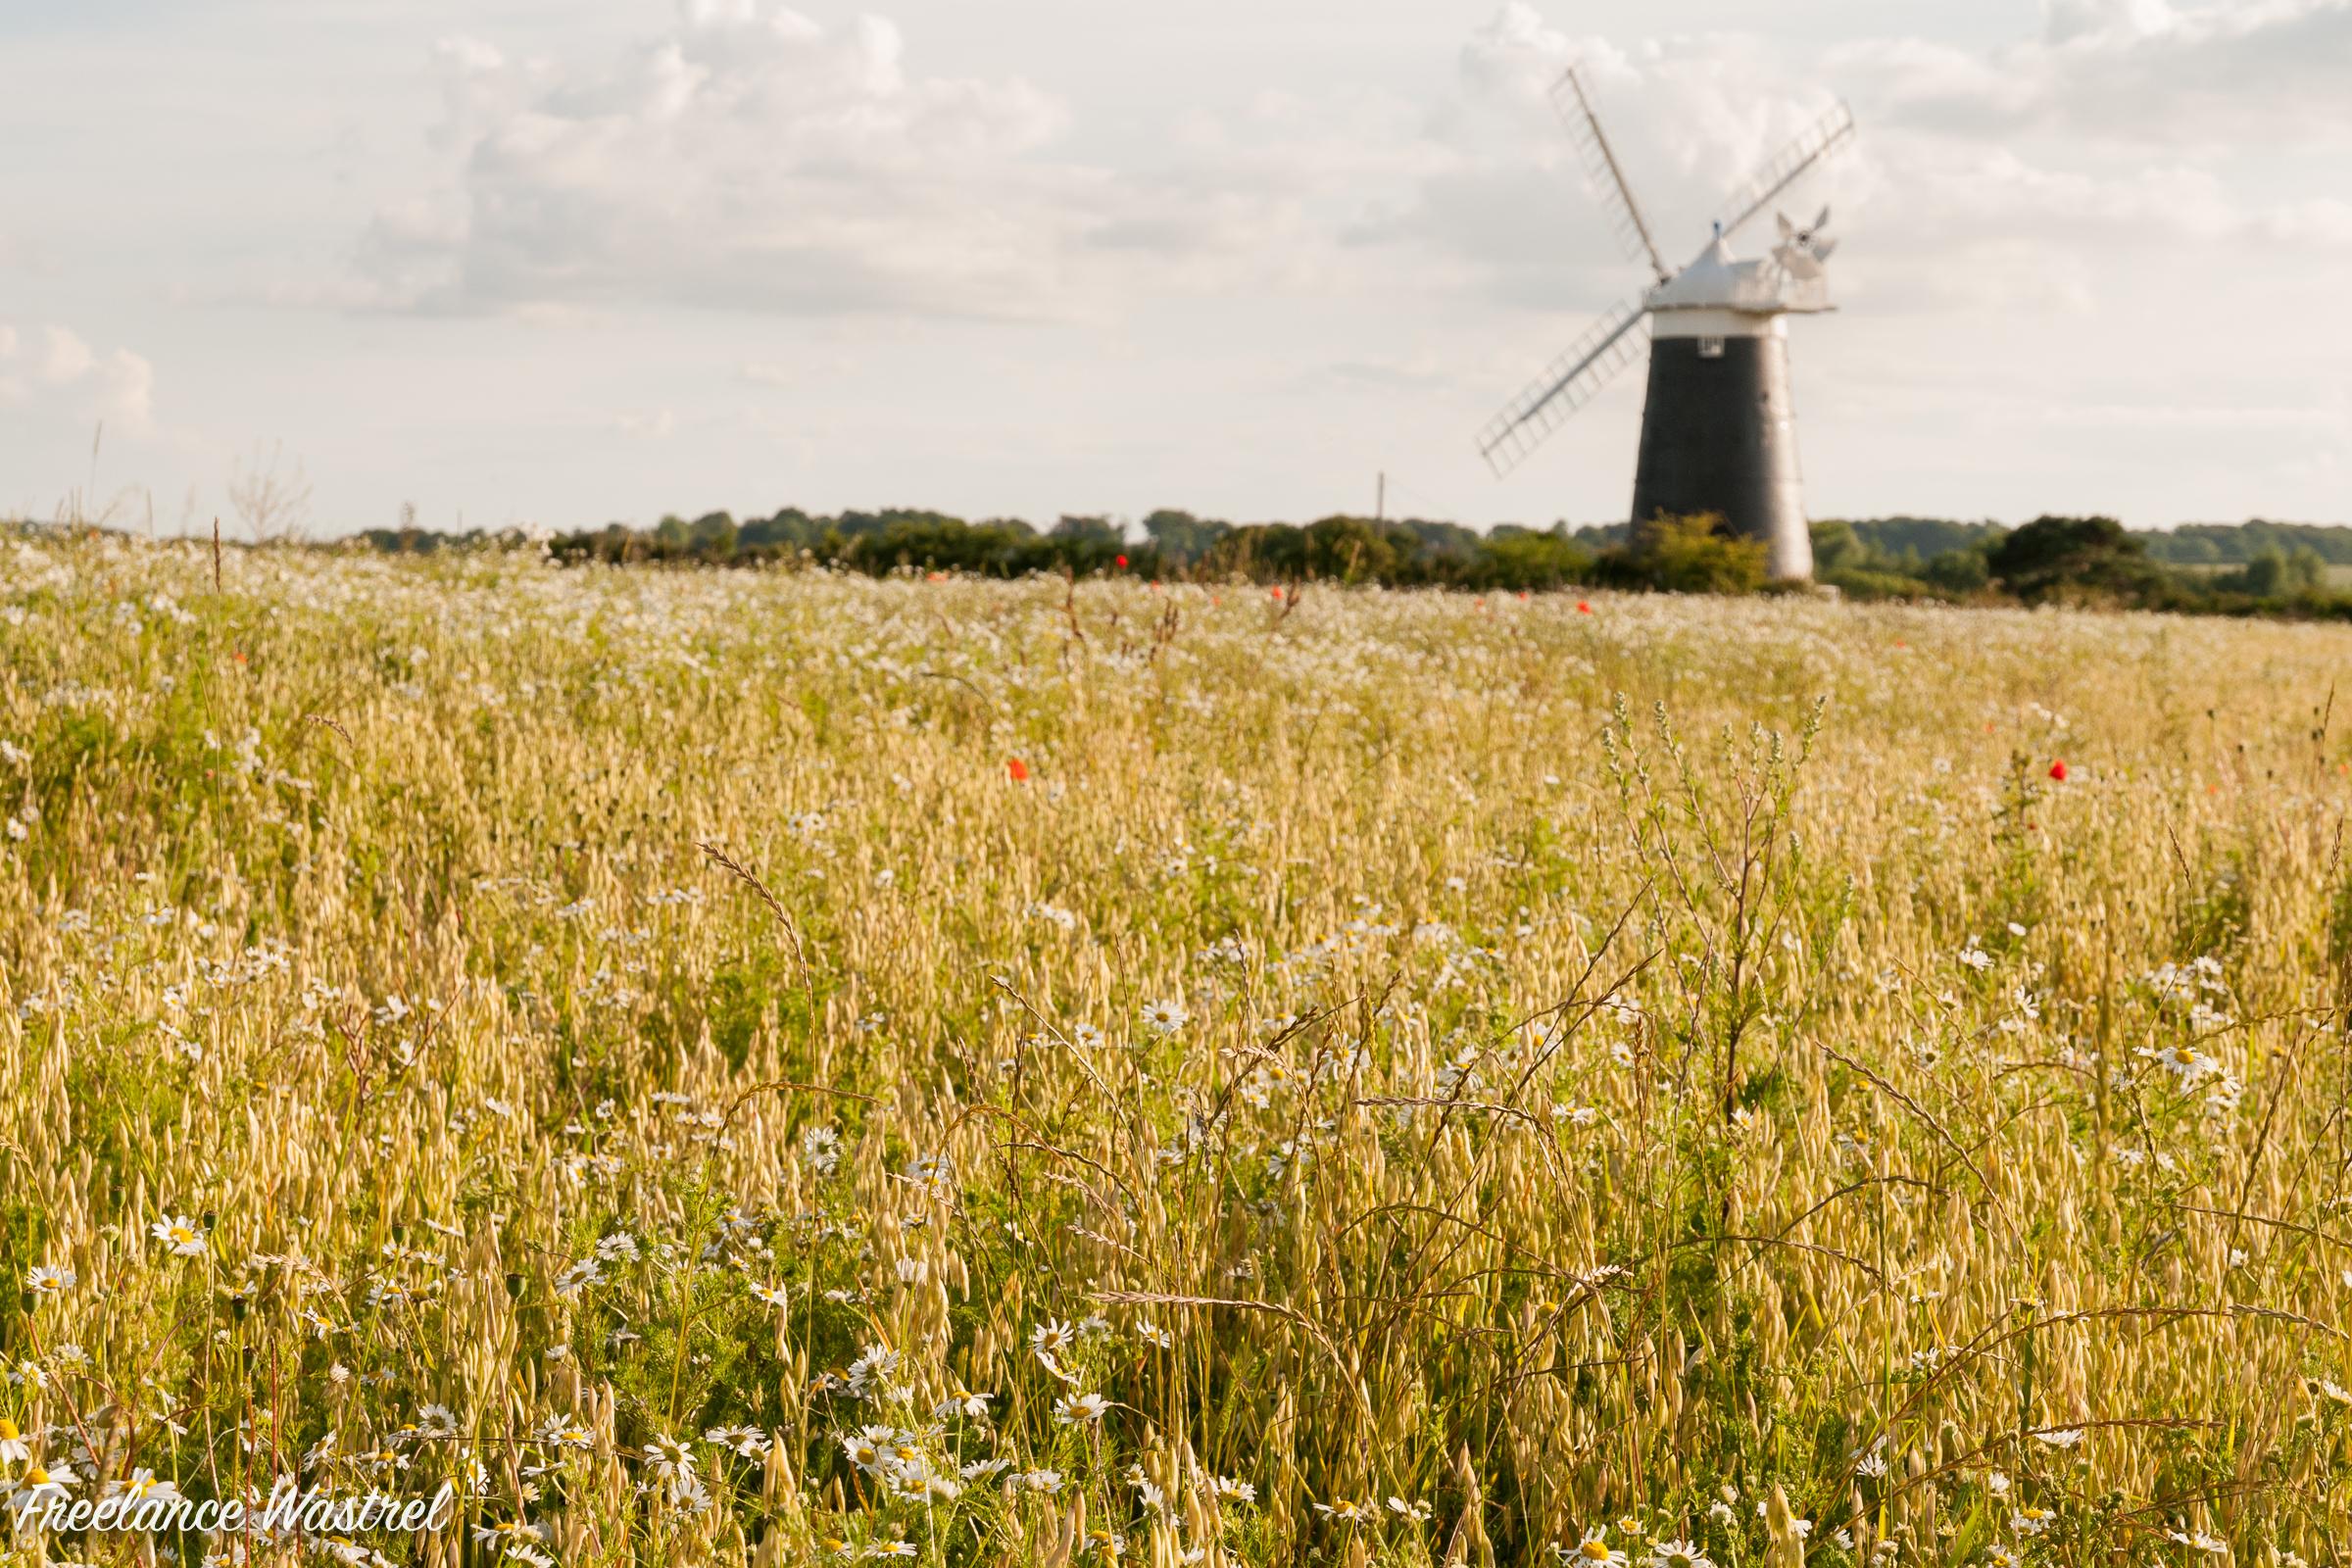 Burnham Overy Staithe Windmill, July 2009